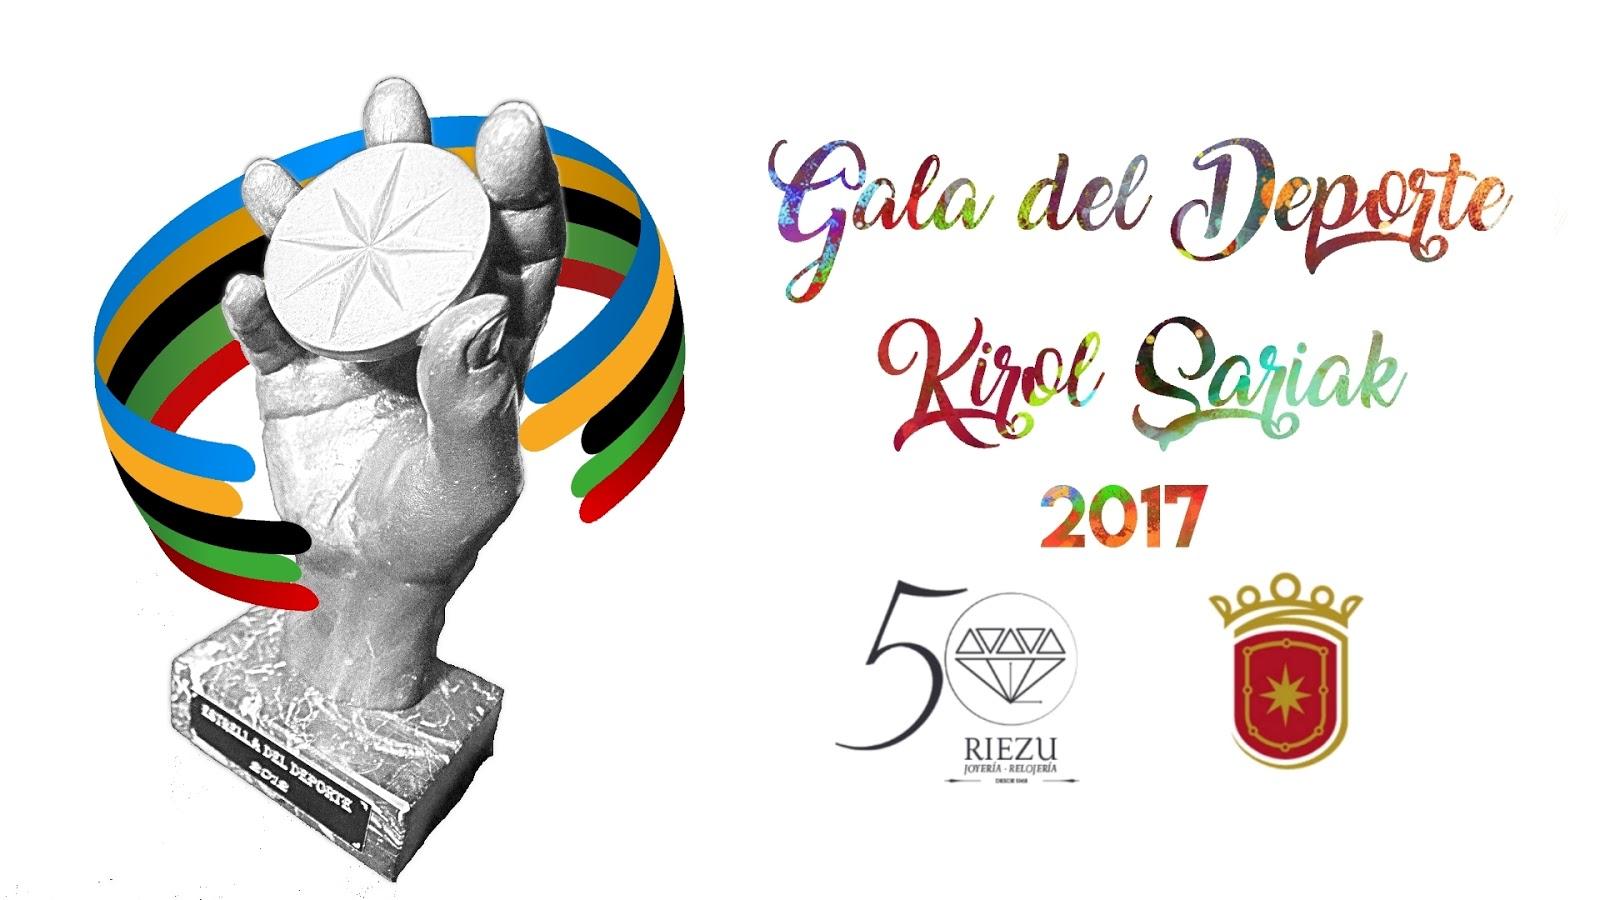 Gala de Deporte 2017